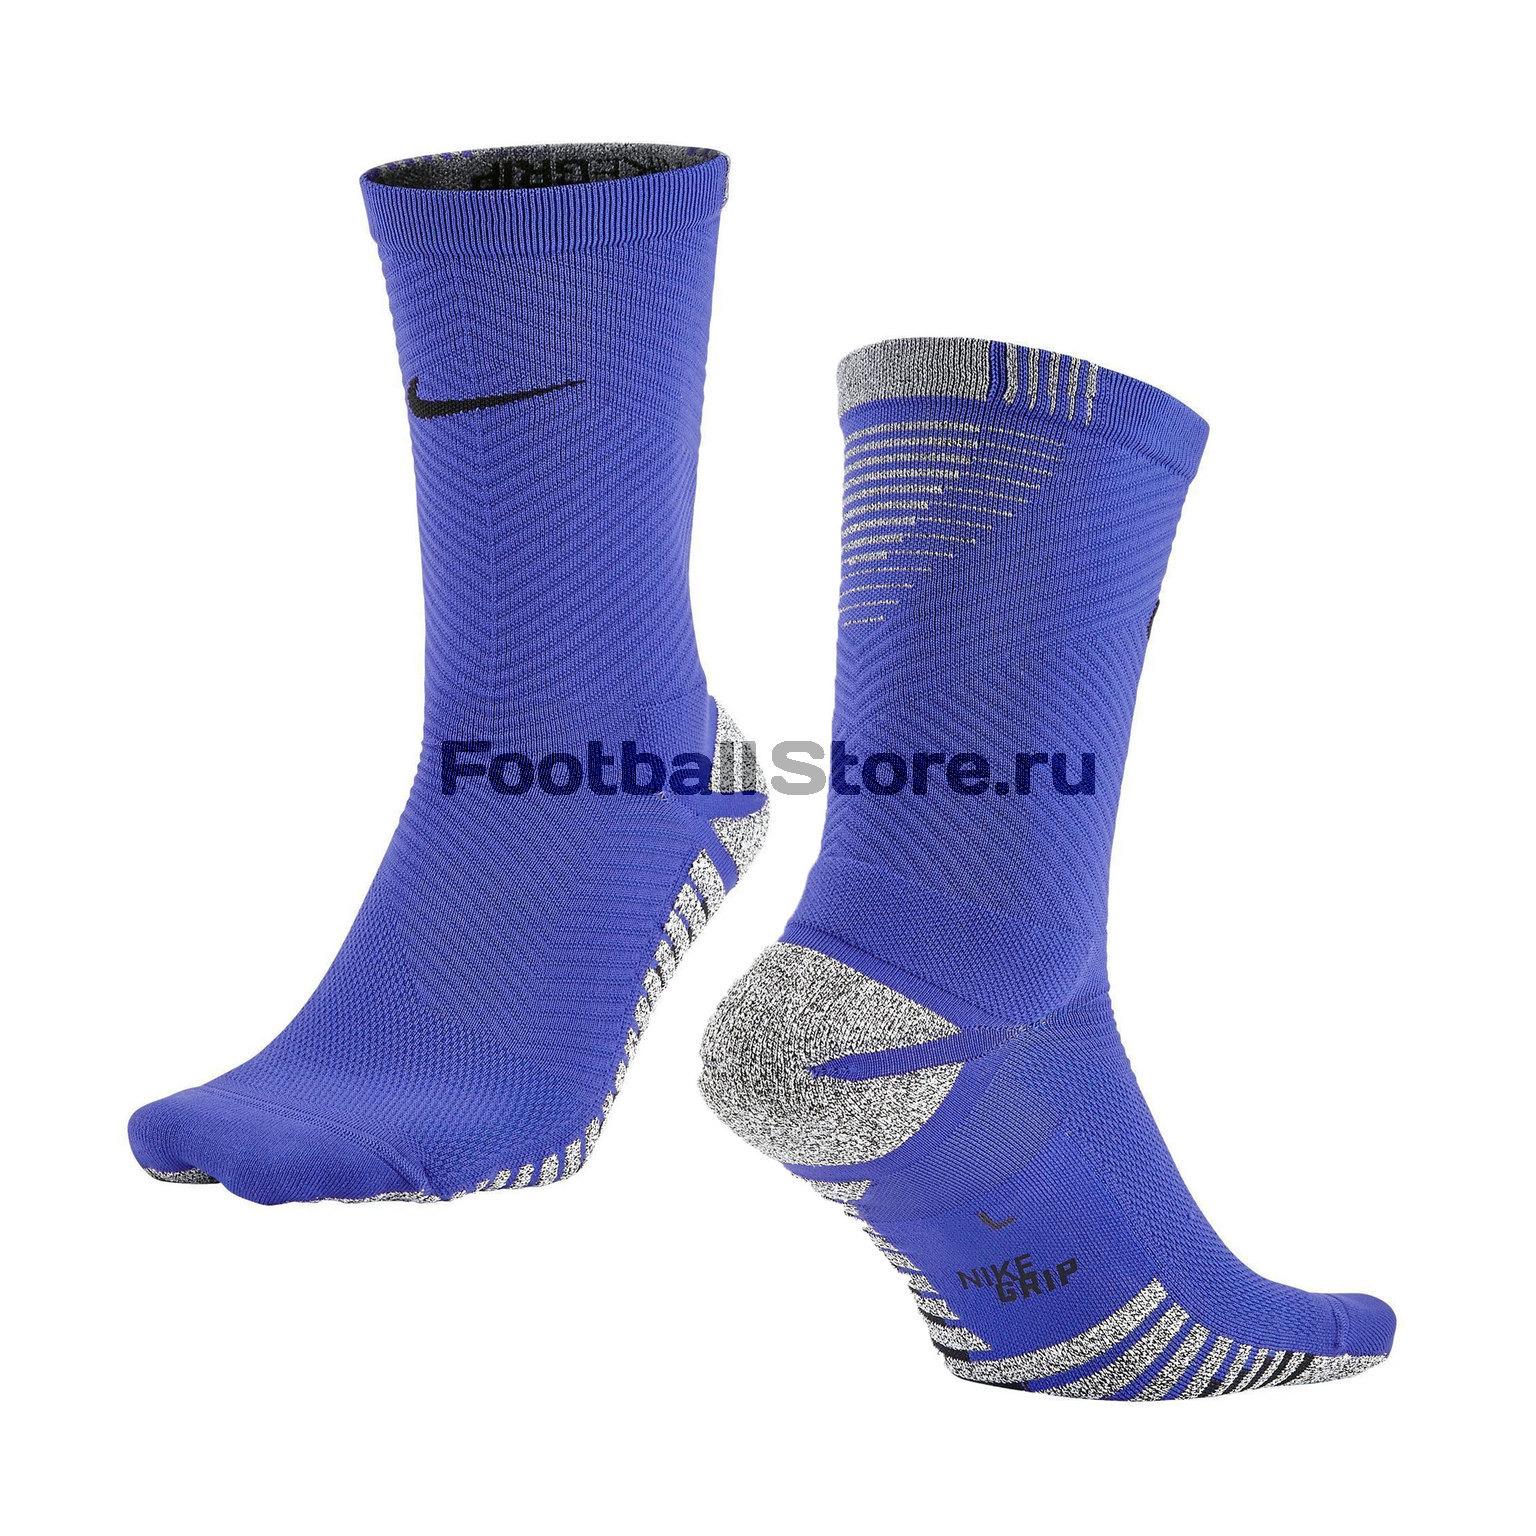 Носки Nike Носки Nike Grip Strike Light Crew SX5486-452 носки nike носки nike grip strike lightweight sx5089 525